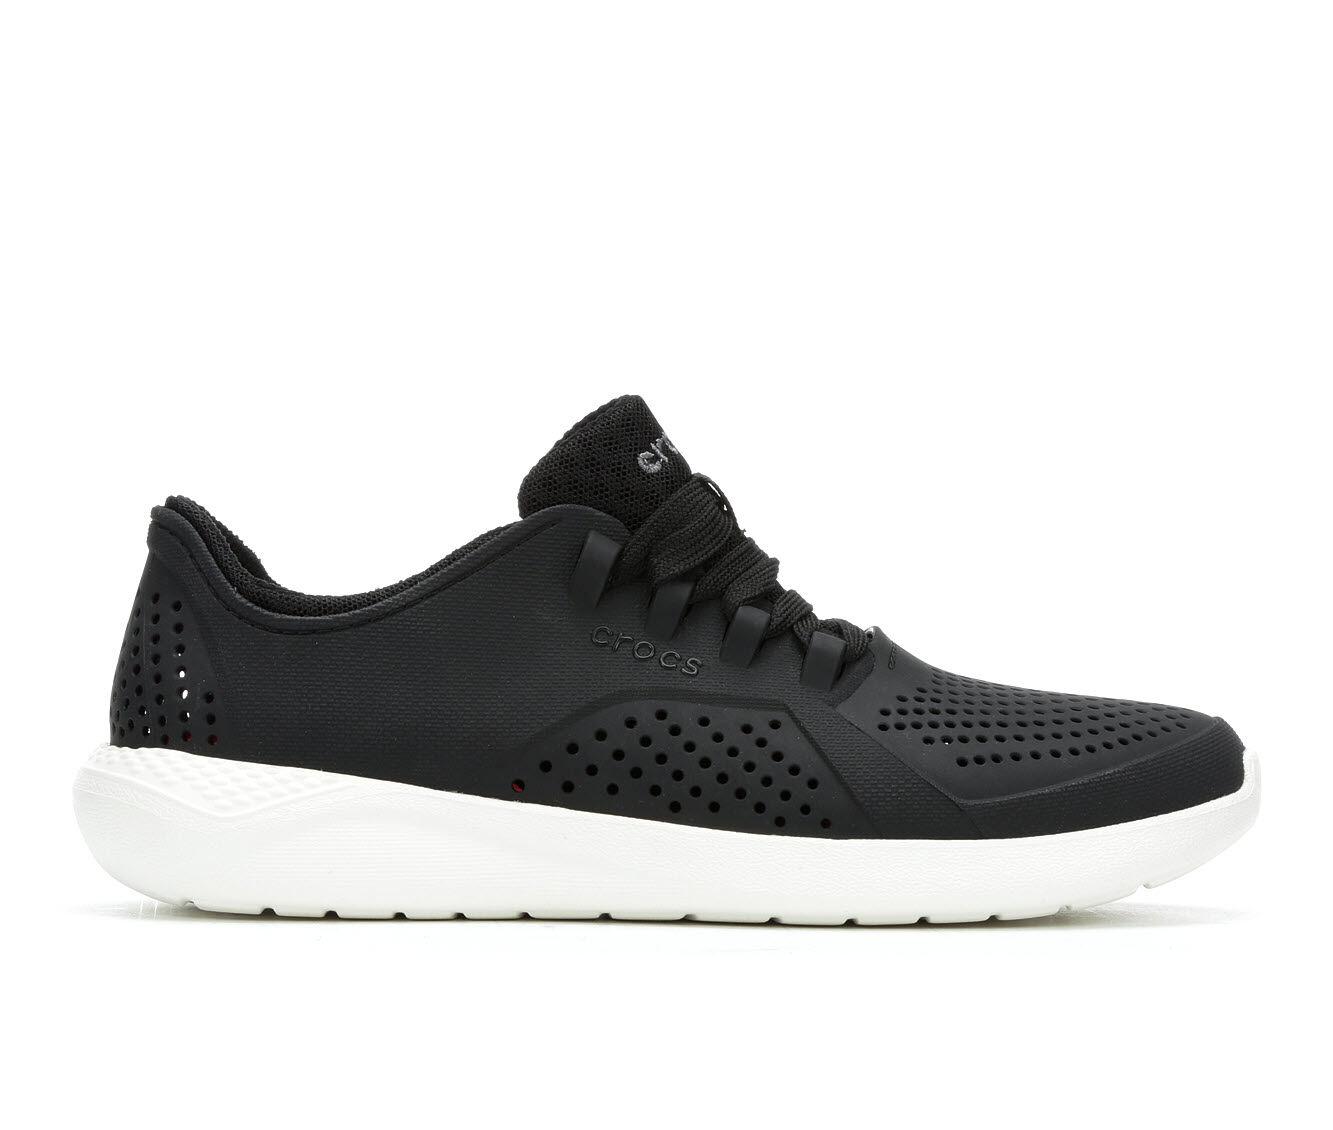 Women's Crocs Literide Graphic Pacer Black/White